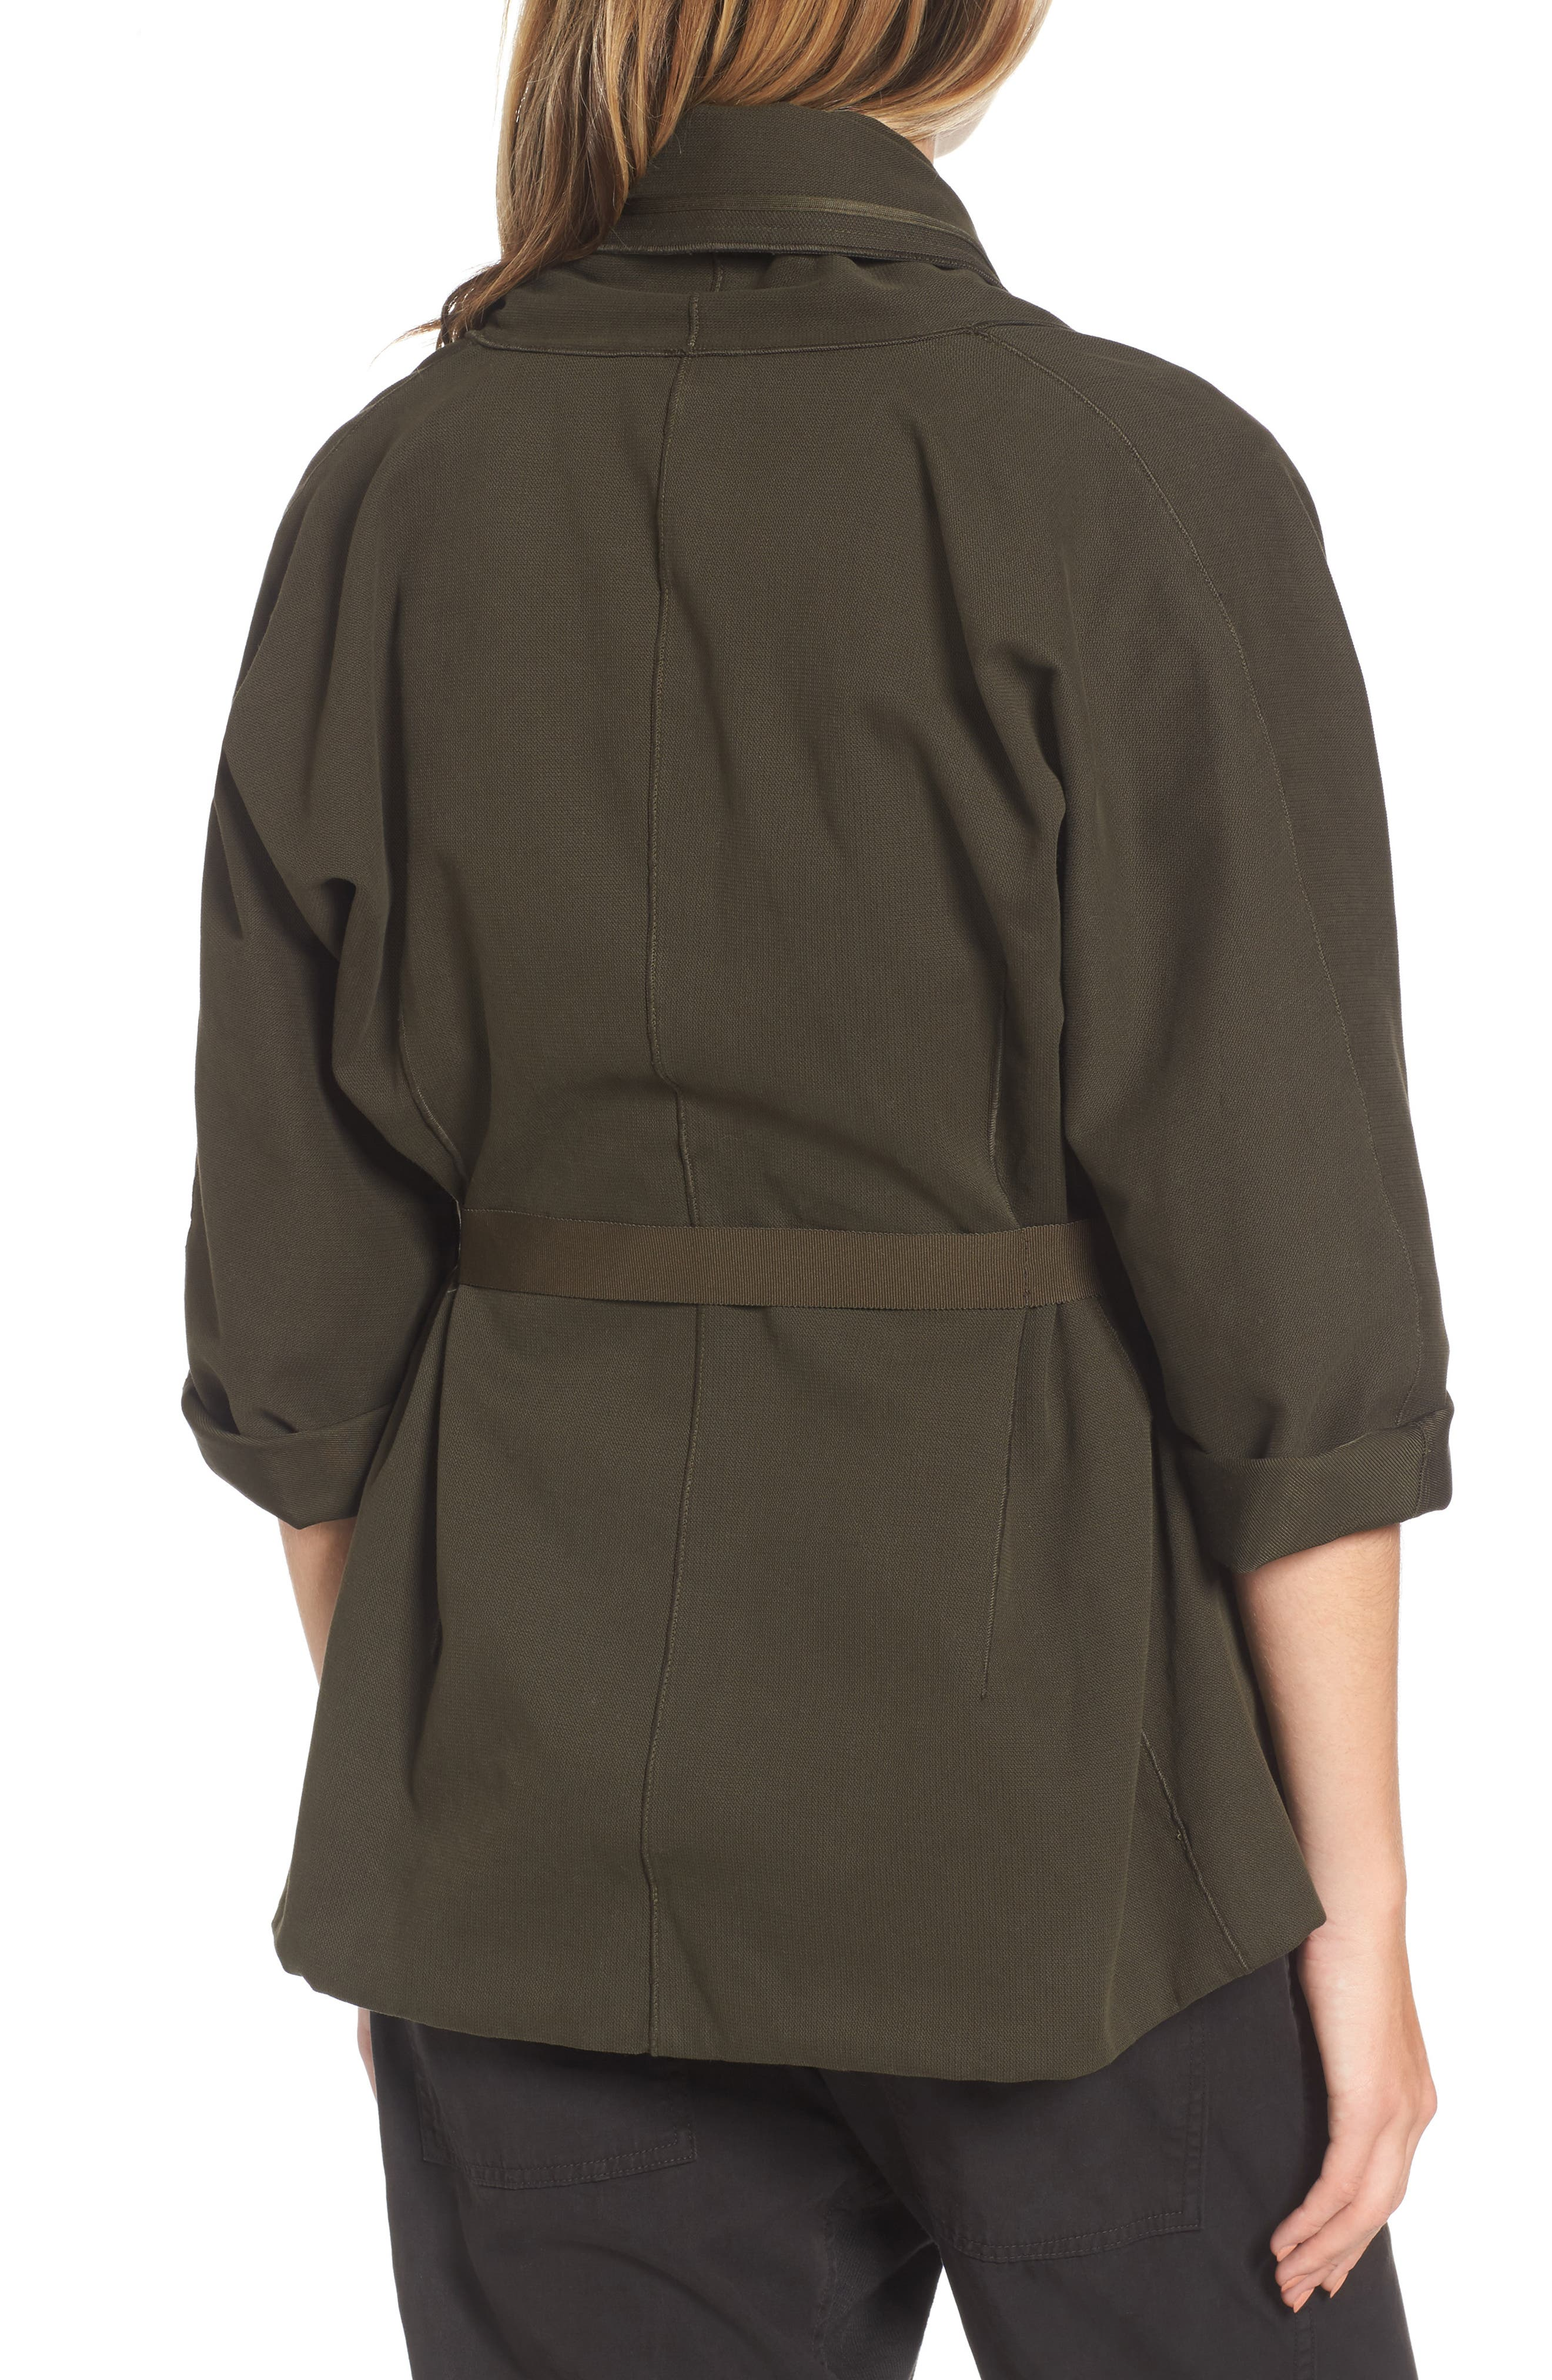 Blanket Kimono Jacket,                             Alternate thumbnail 2, color,                             Smoky Green